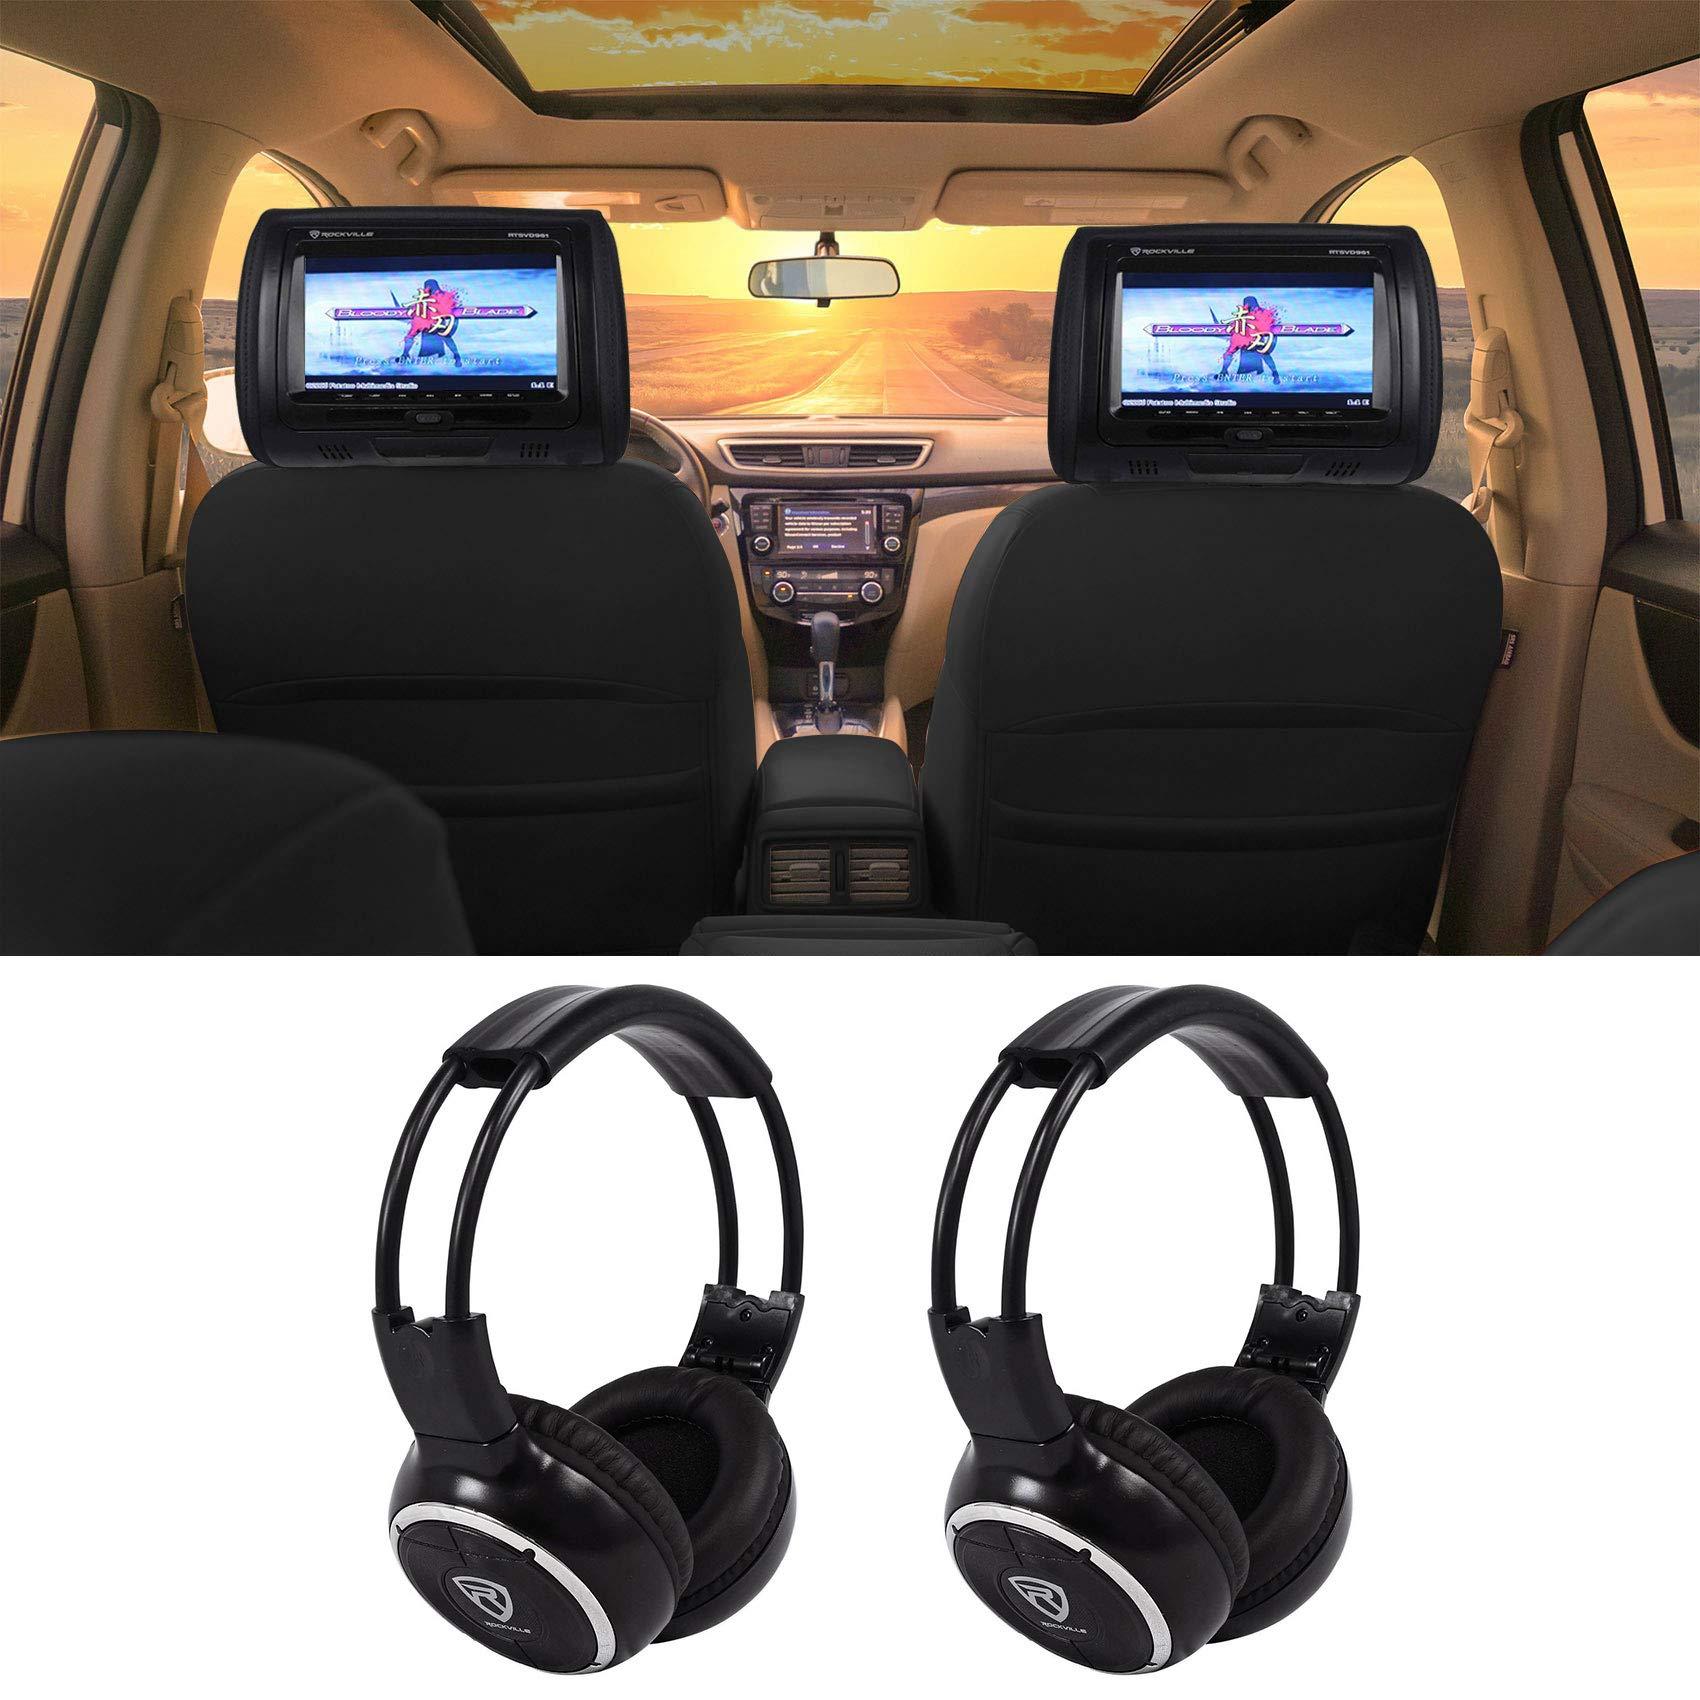 Rockville RTSVD961 BK Touchscreen Headrest Headphones